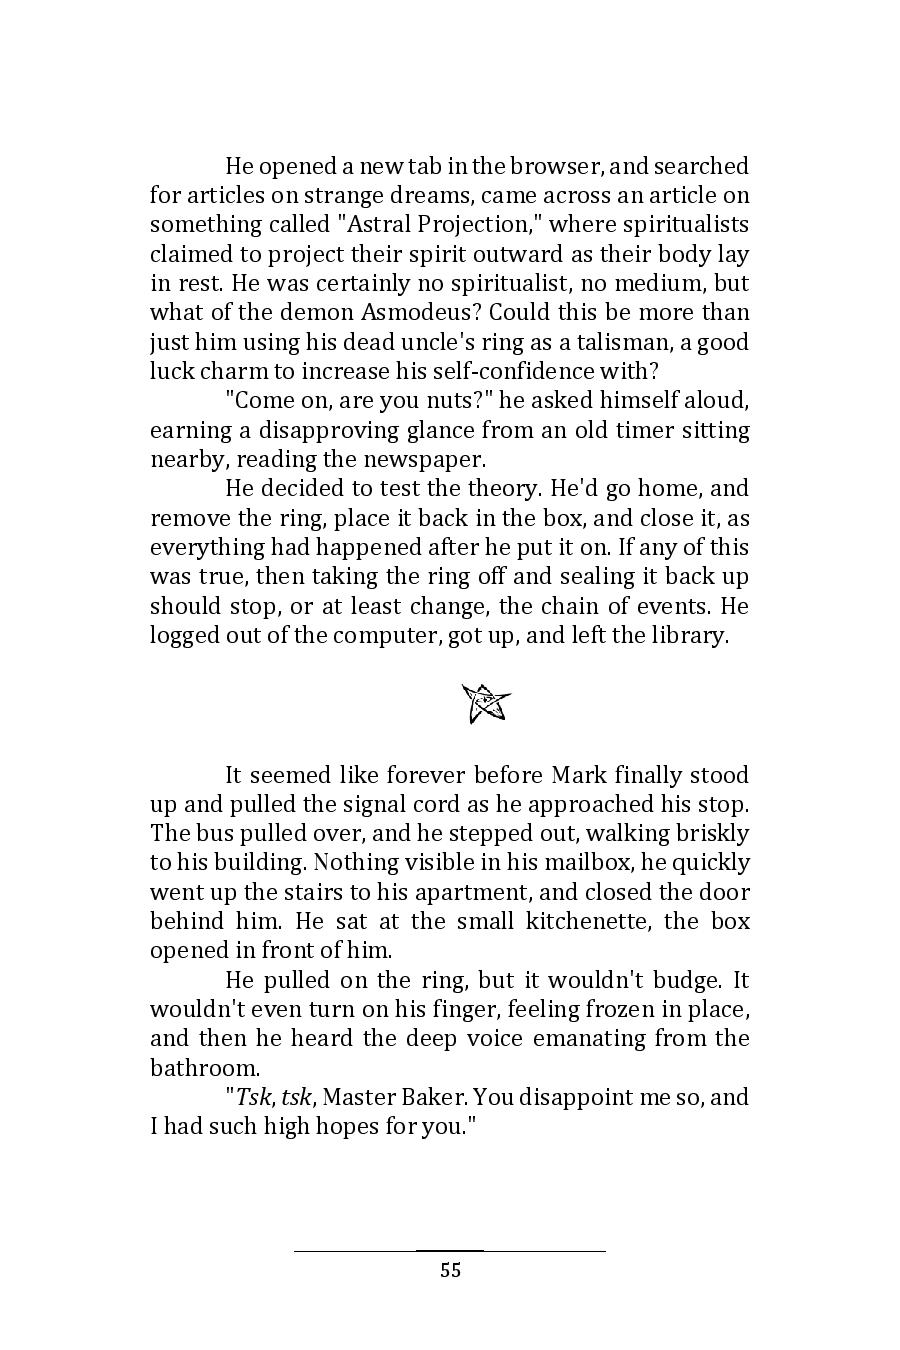 Hinnom Magazine 001 Manuscript 10-page-059